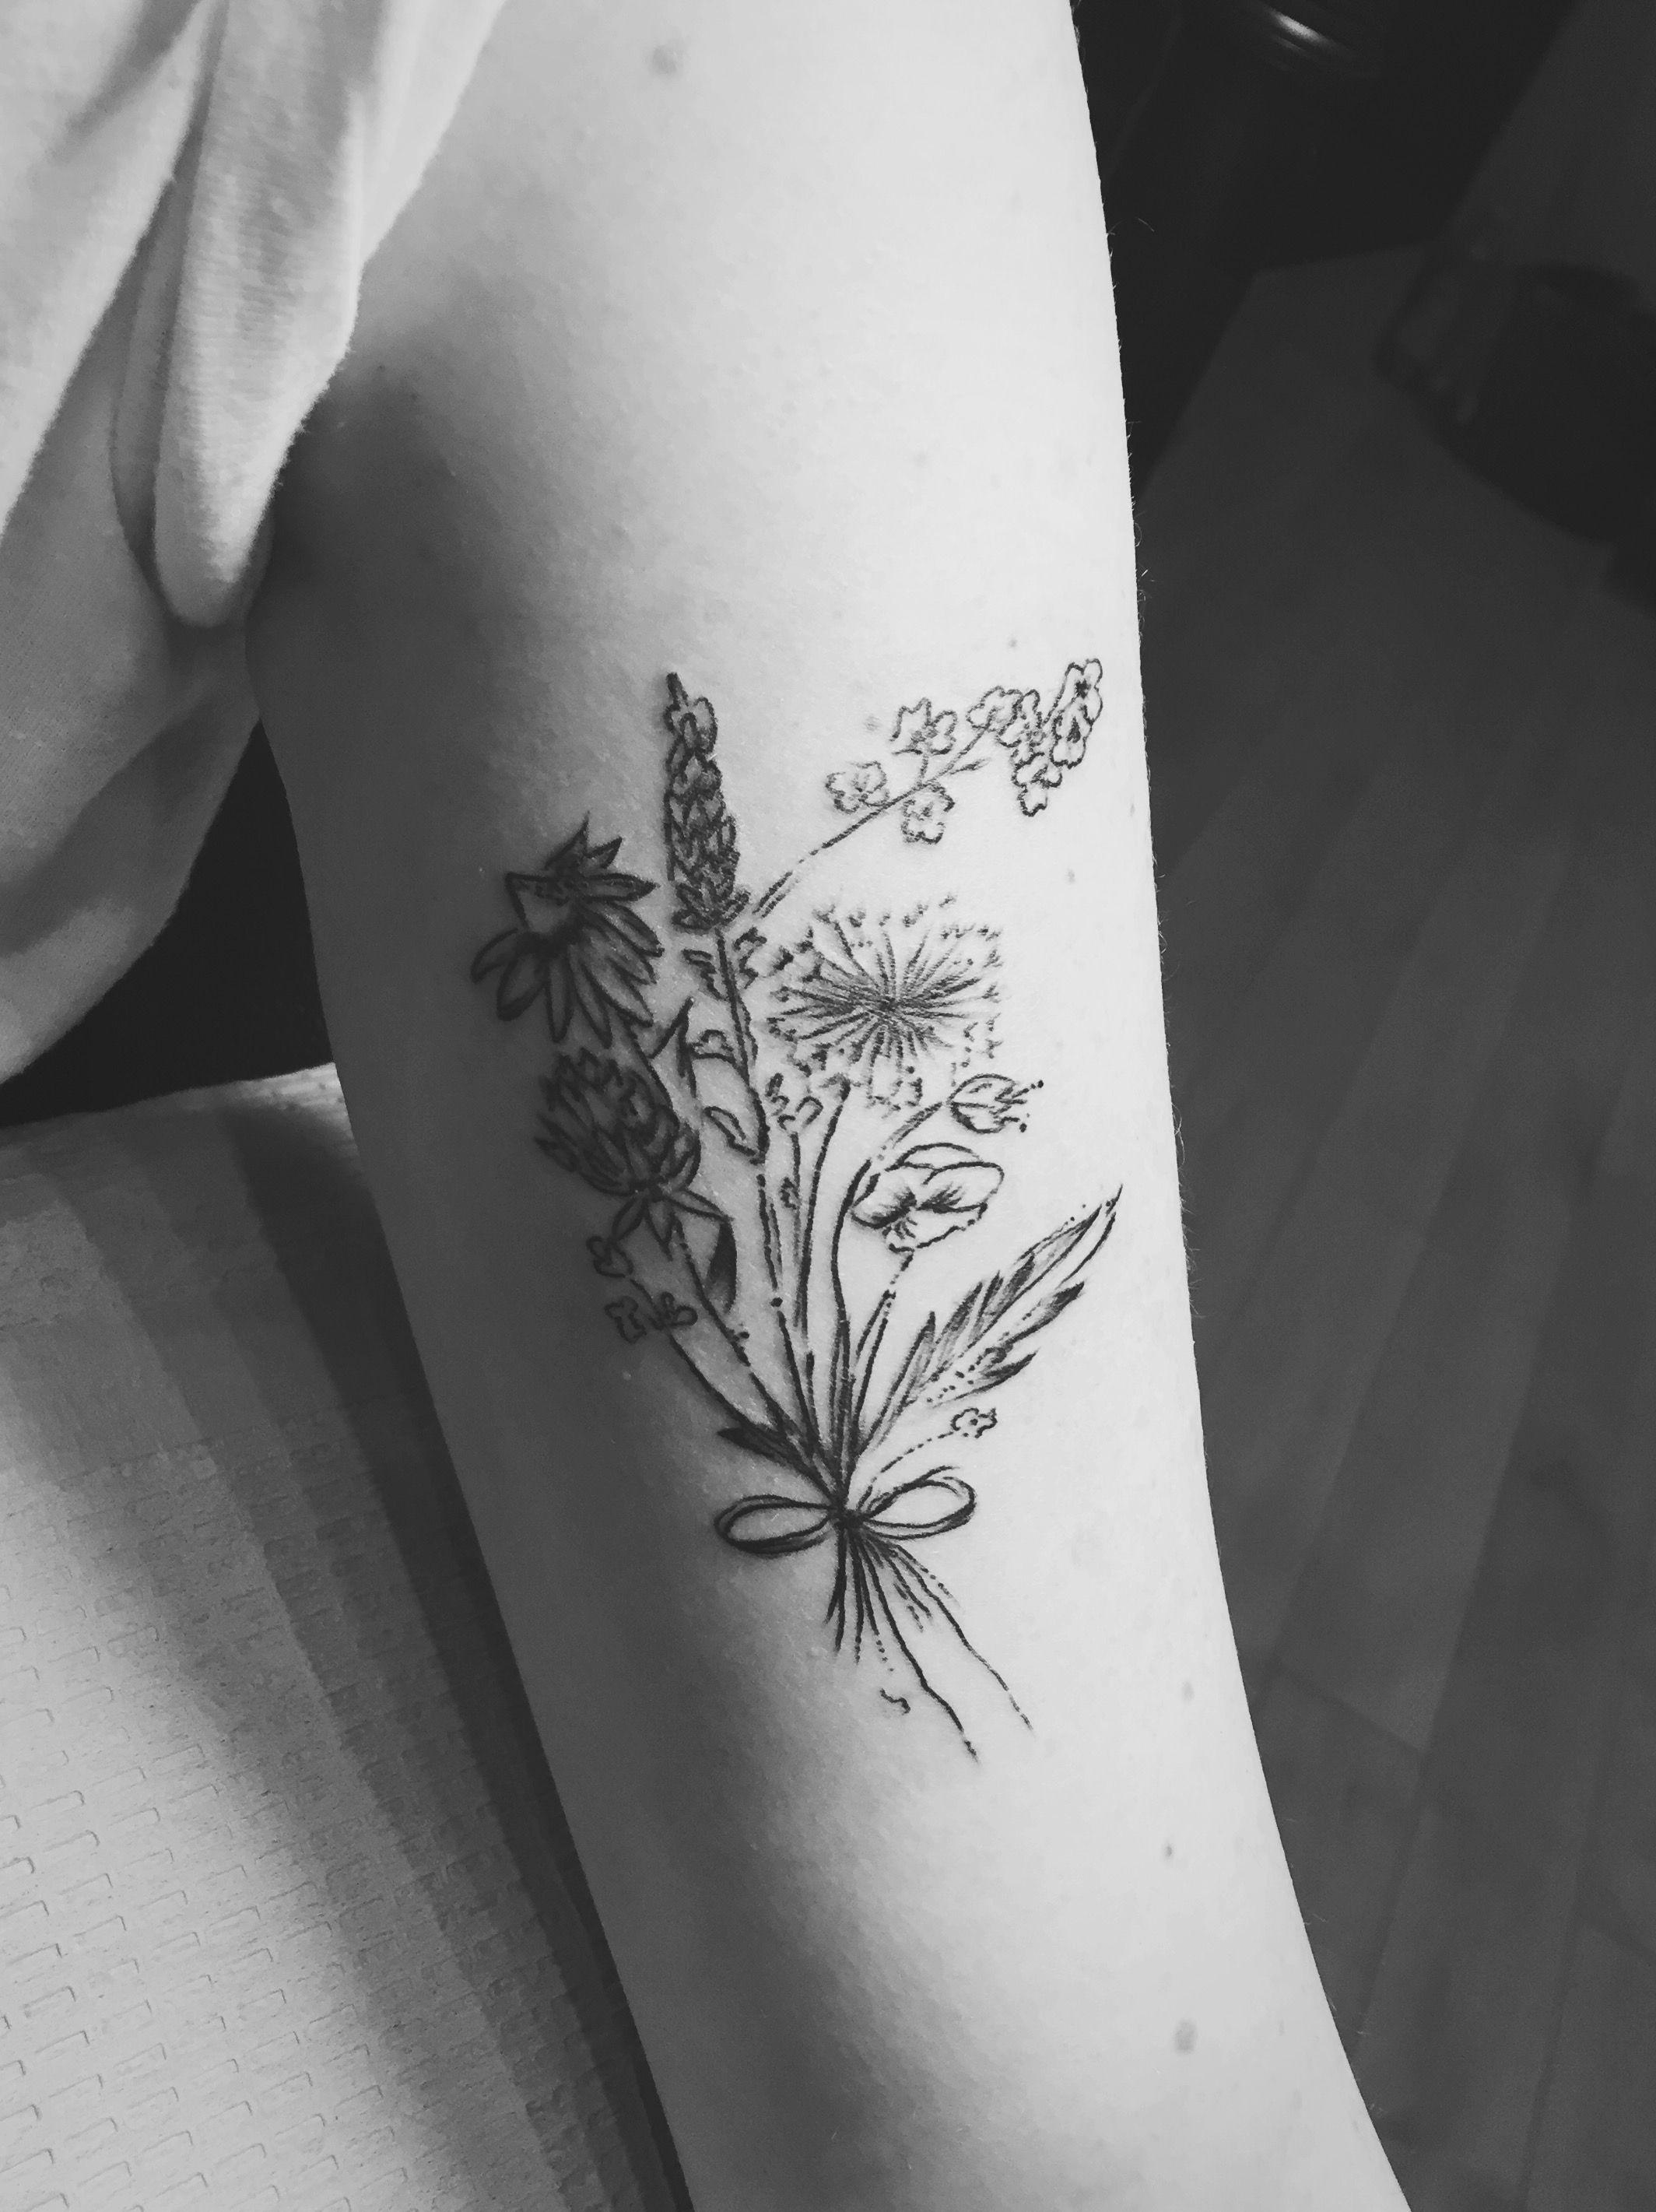 Forguys Designs Ideas Formen Minimalist Forwomen Sleeve Geometric Drawings Traditional Sketches Dragon S In 2020 Wildflower Tattoo Daffodil Tattoo Tattoos